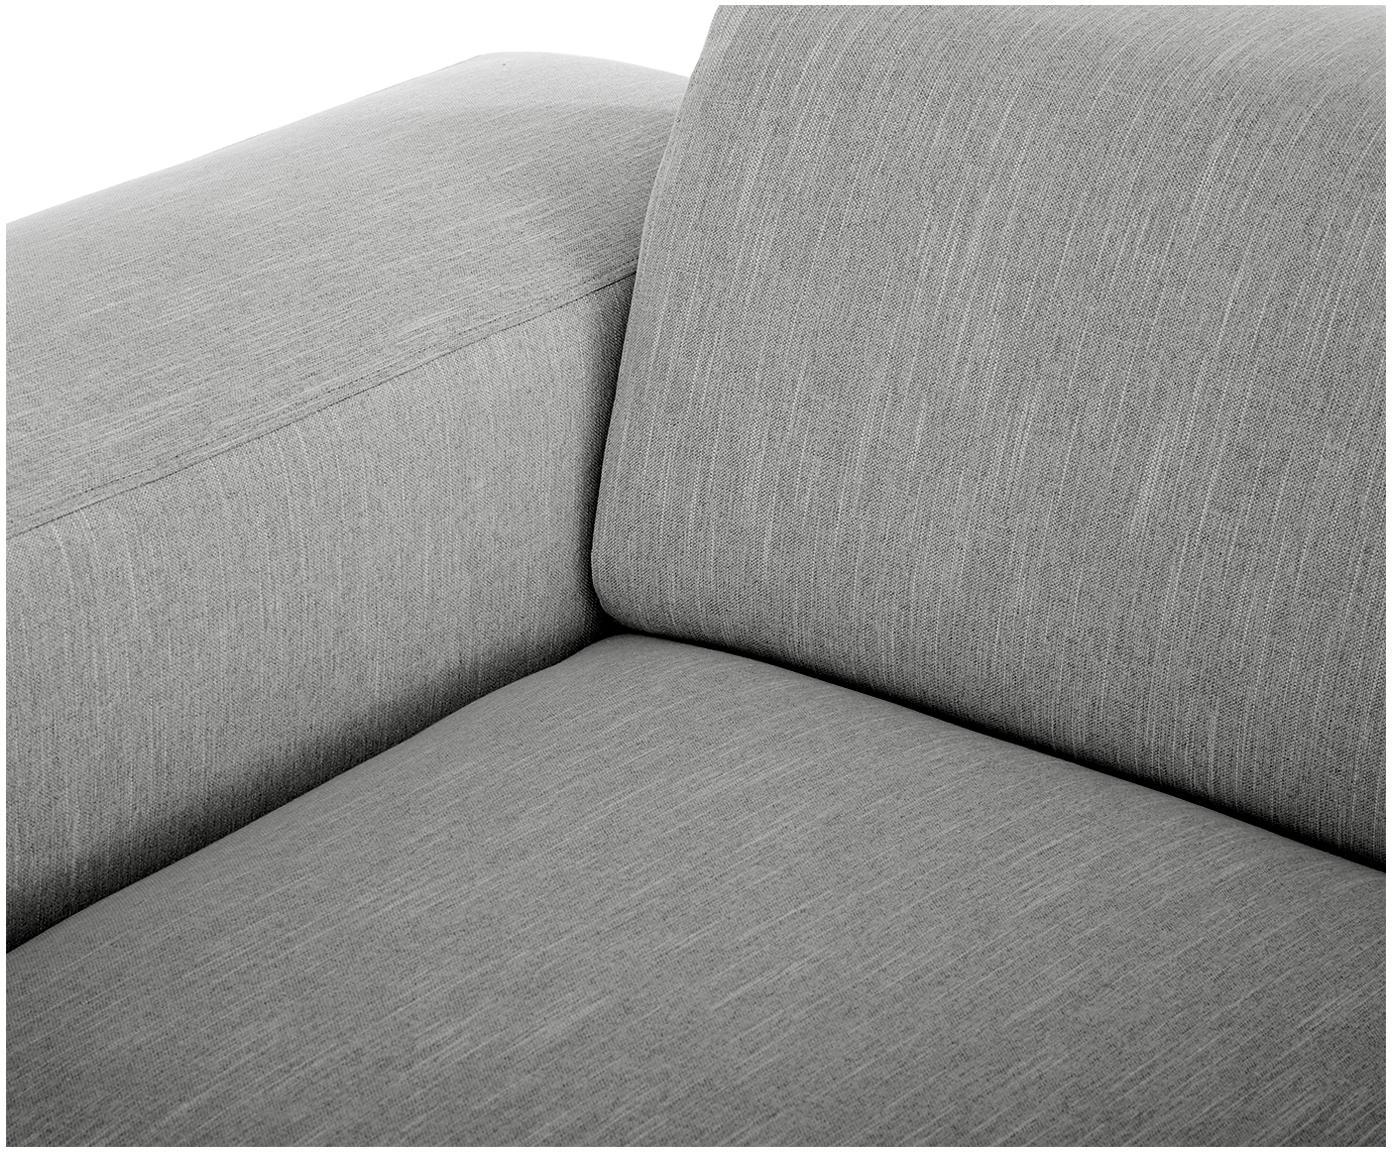 Ecksofa Melva (3-Sitzer), Bezug: Polyester 35.000 Scheuert, Gestell: Massives Kiefernholz, Spa, Webstoff Grau, B 240 x T 144 cm